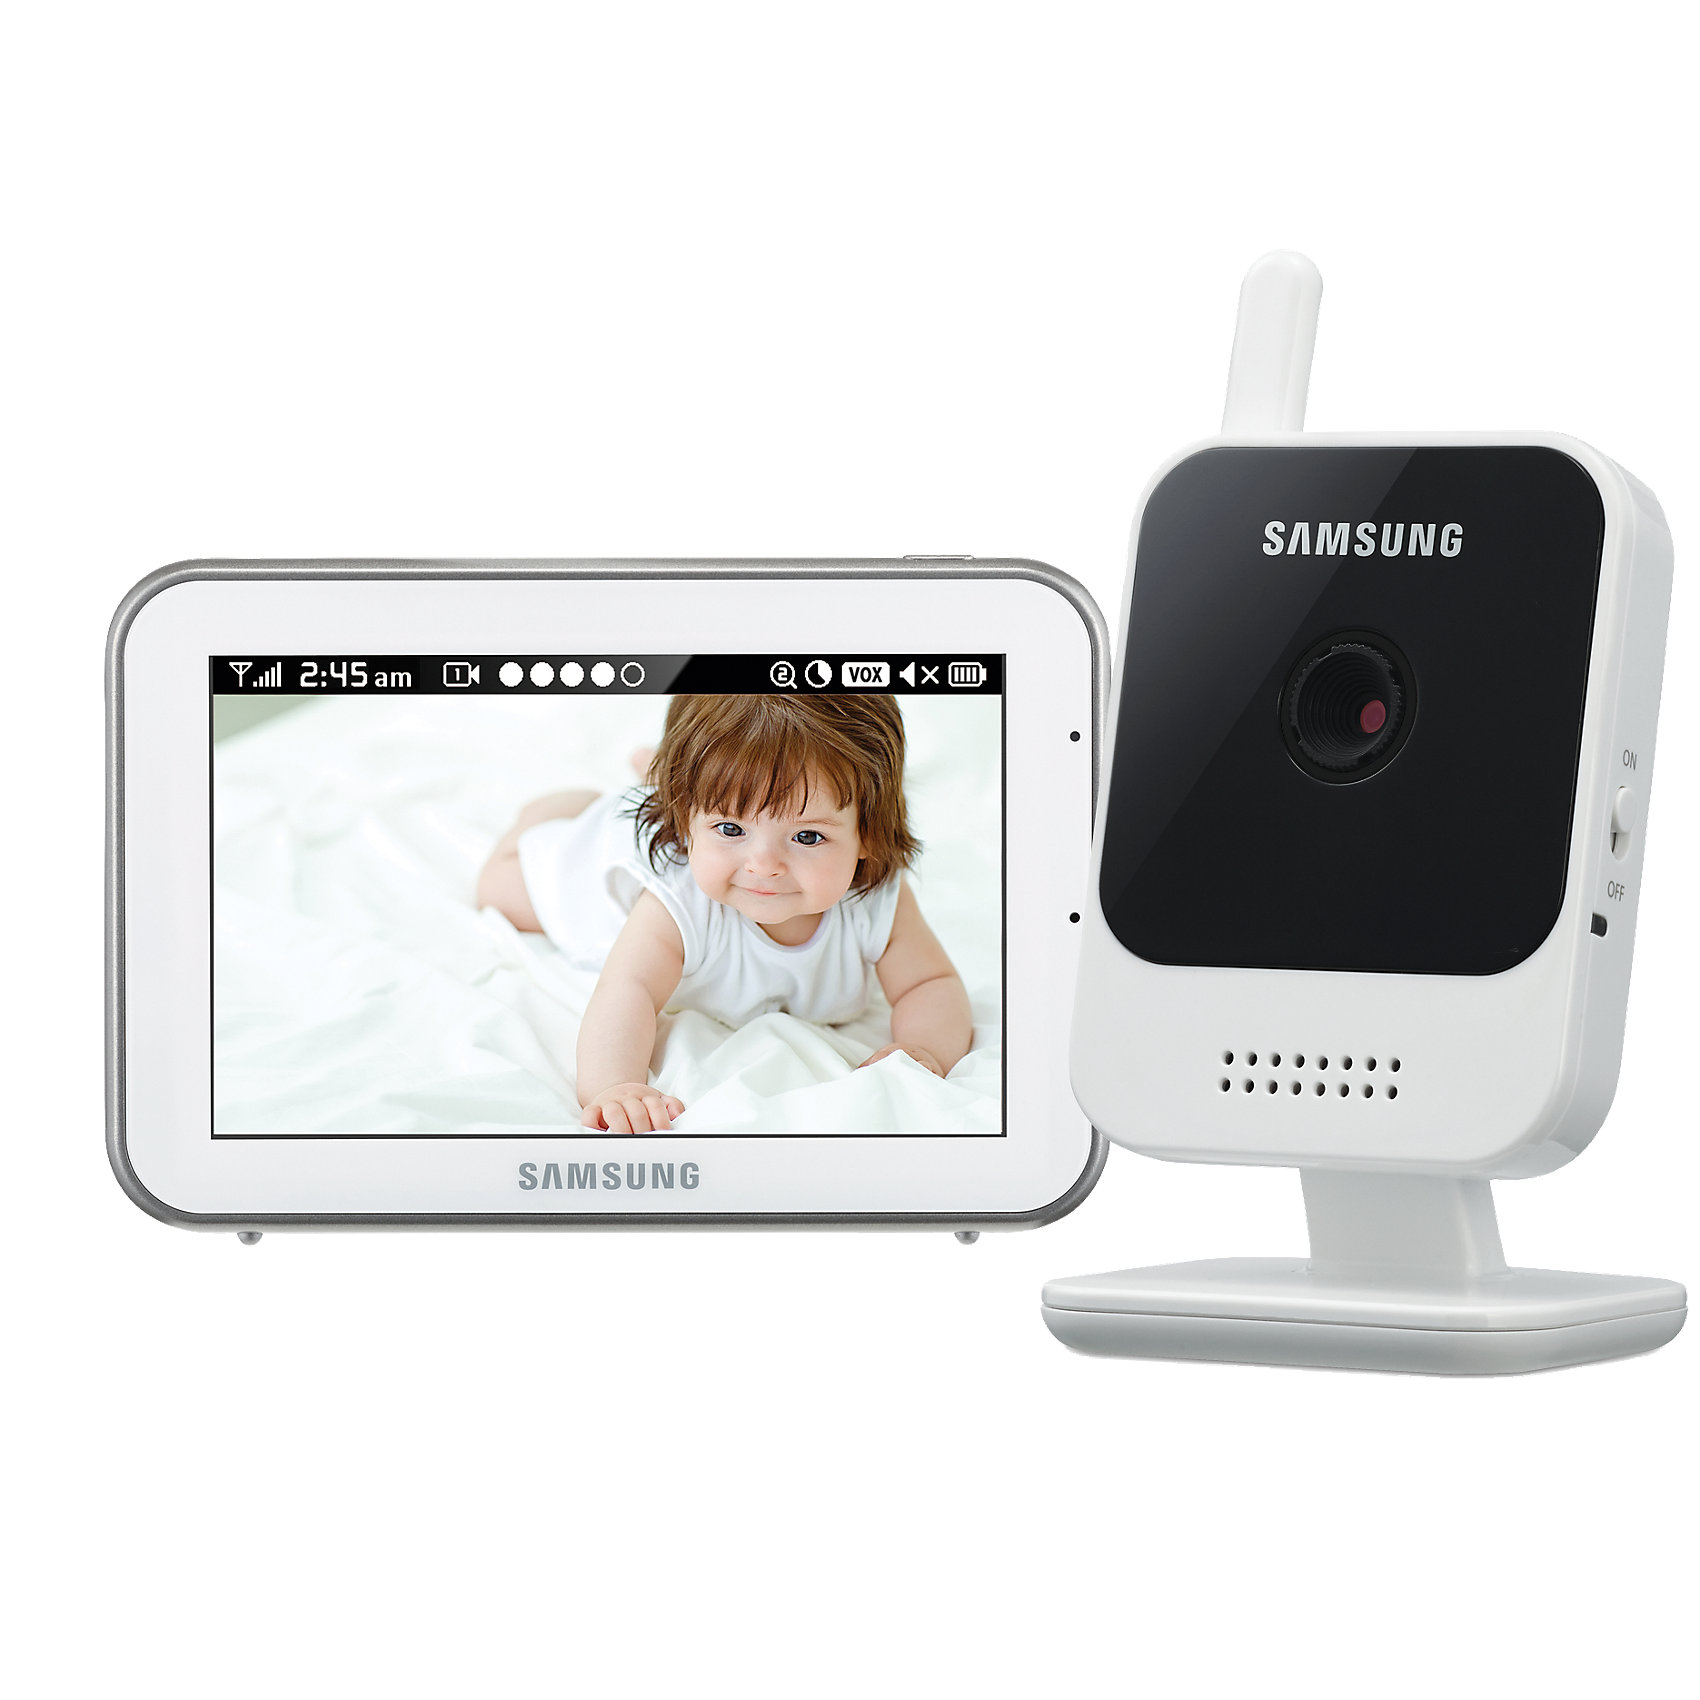 Samsung Видеоняня Sew-3042, Samsung samsung видеоняня sew 3042 samsung